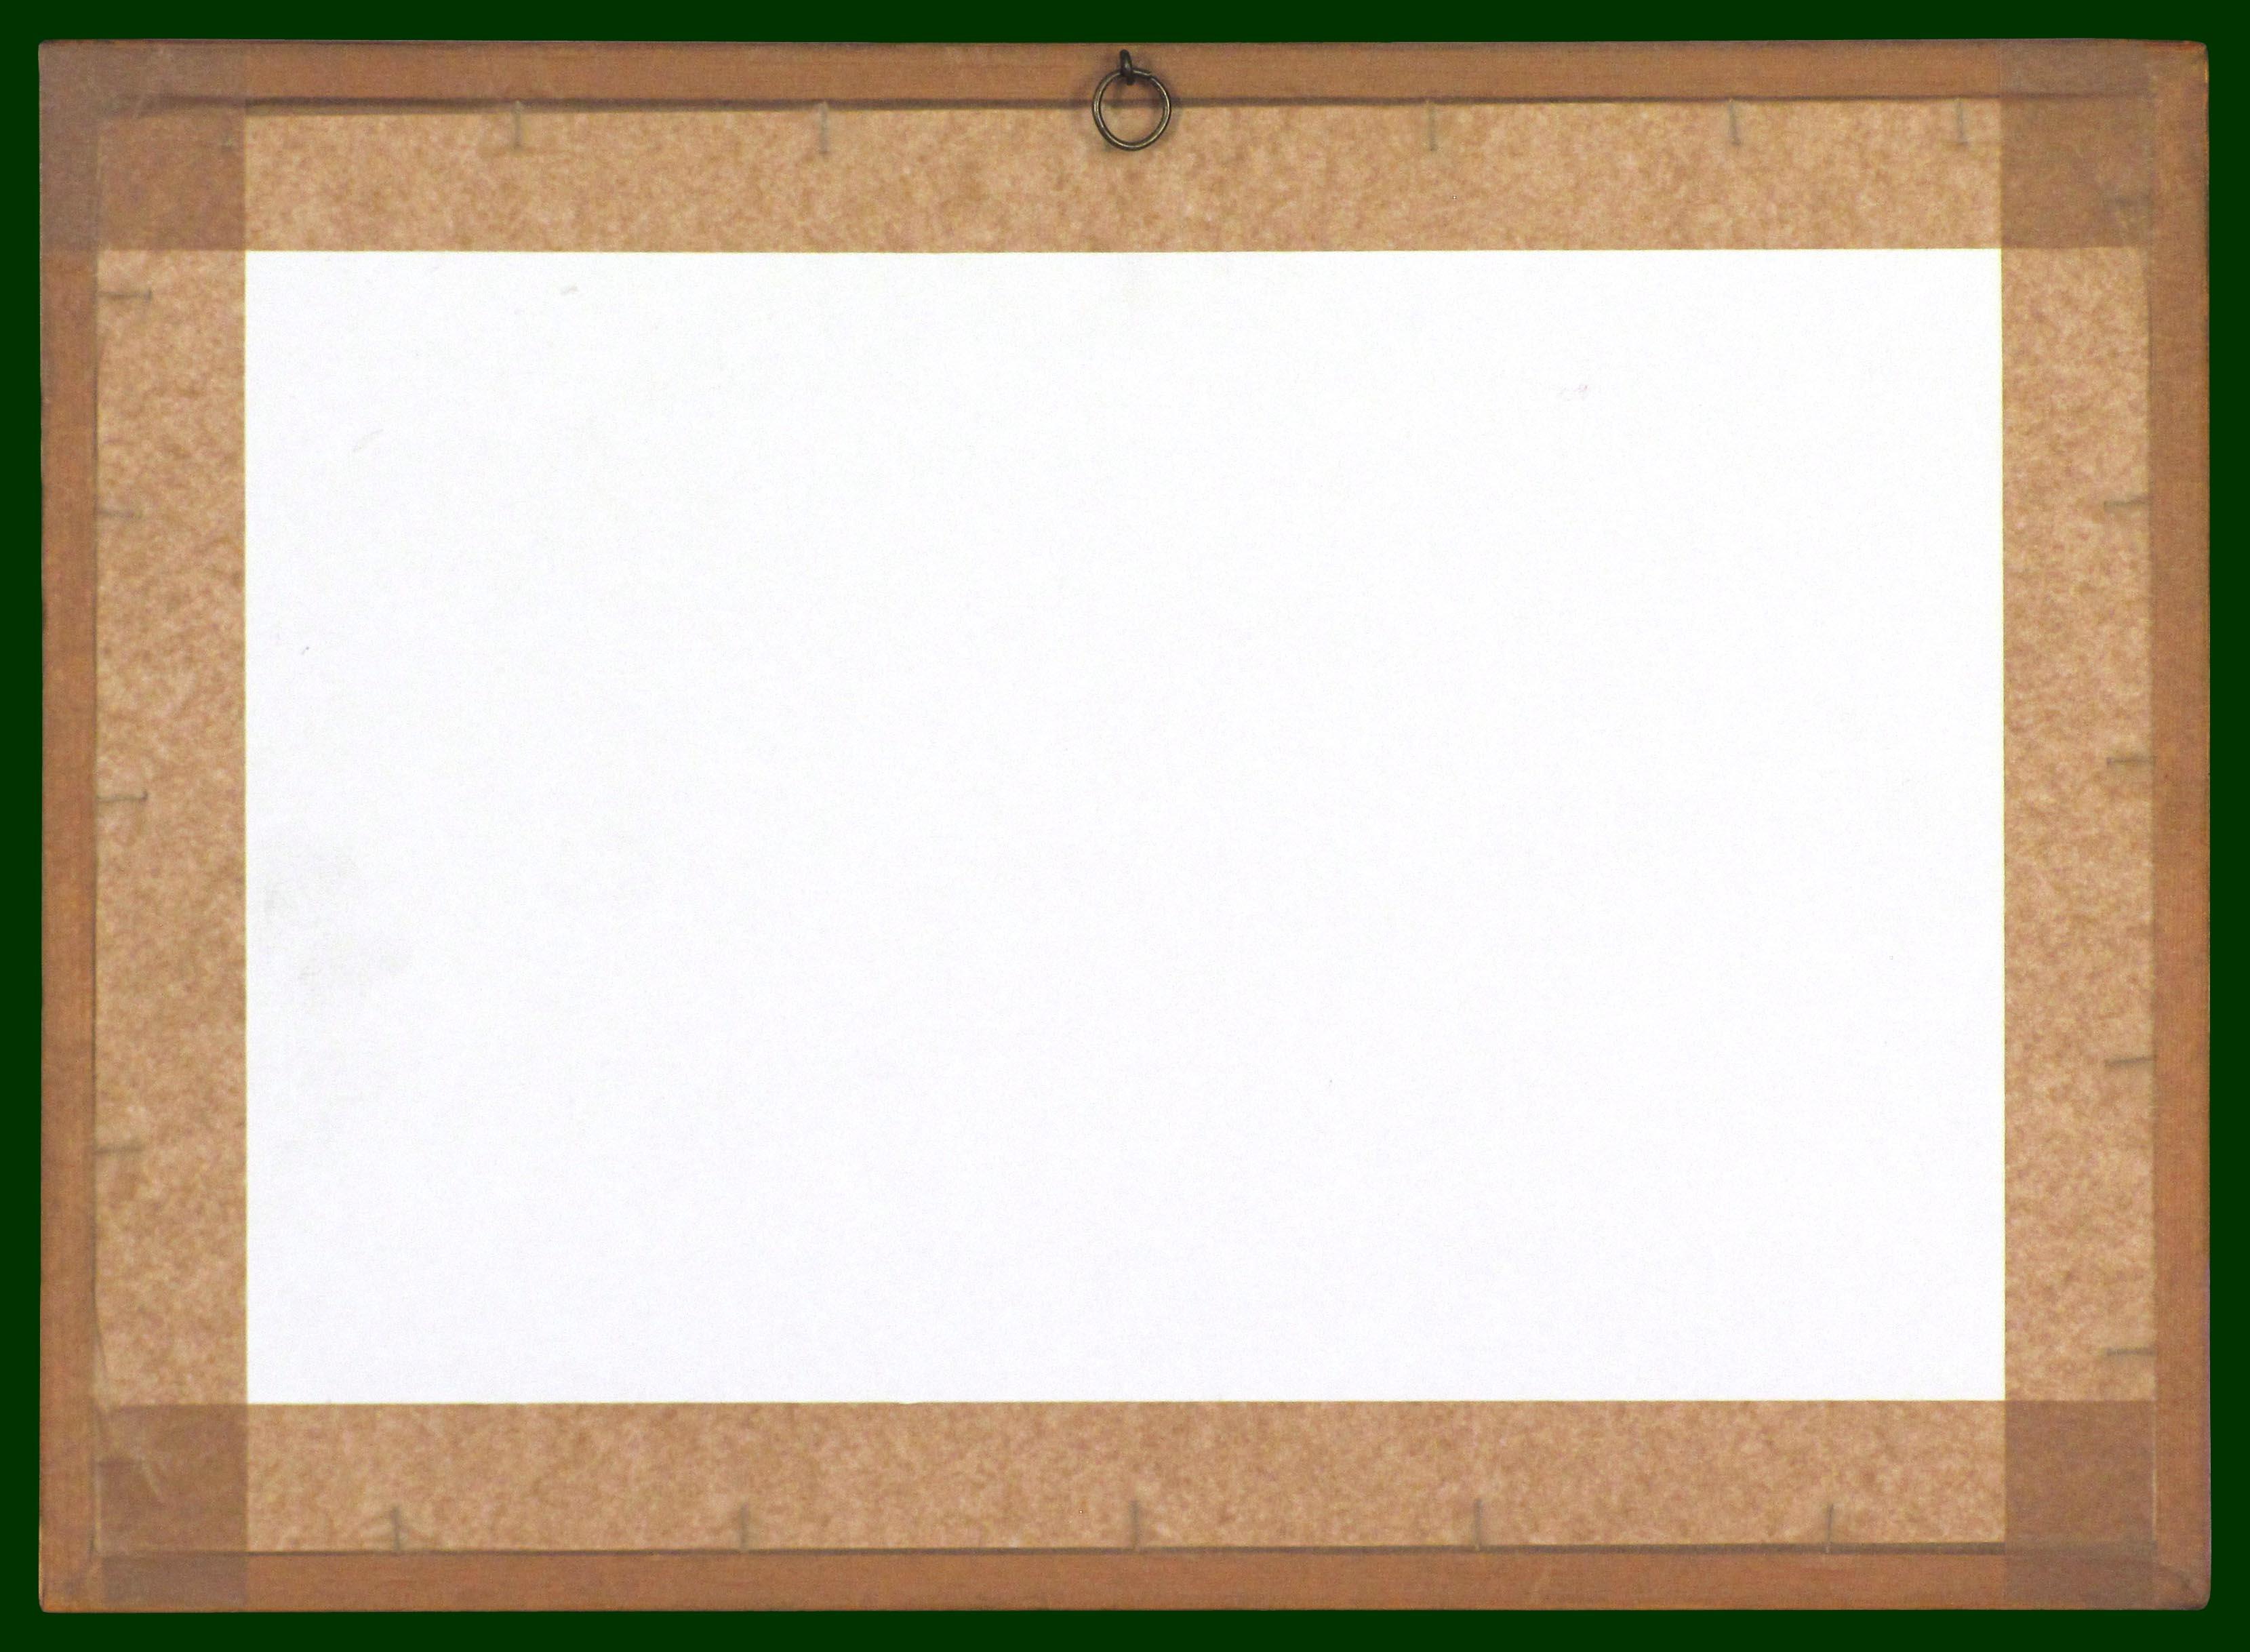 205-13hat.jpg (3319×2437)